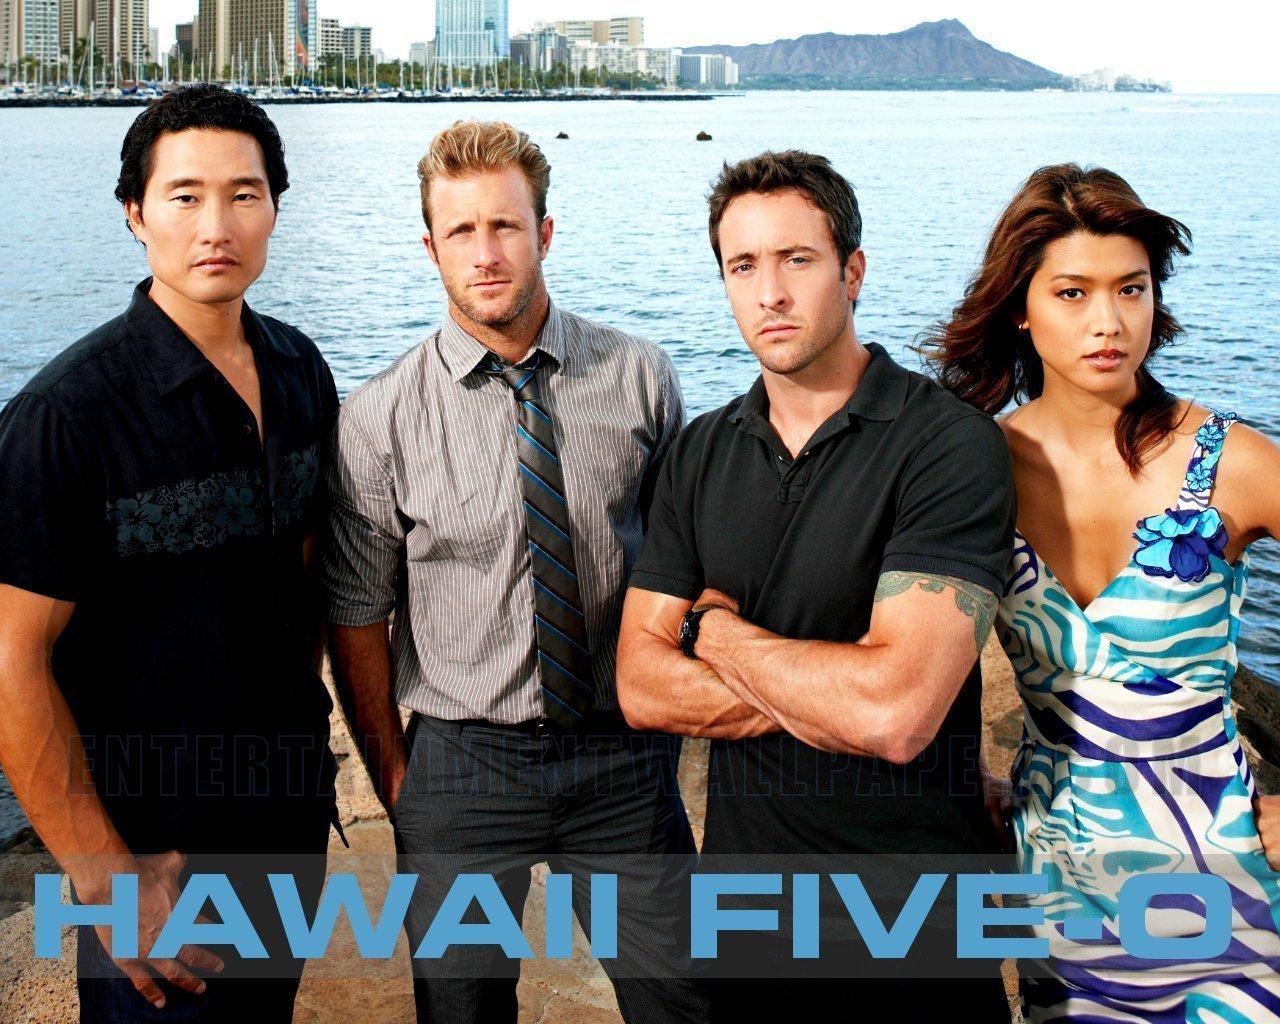 Hawaii Five-O (2010 series) | Cinemorgue Wiki | FANDOM